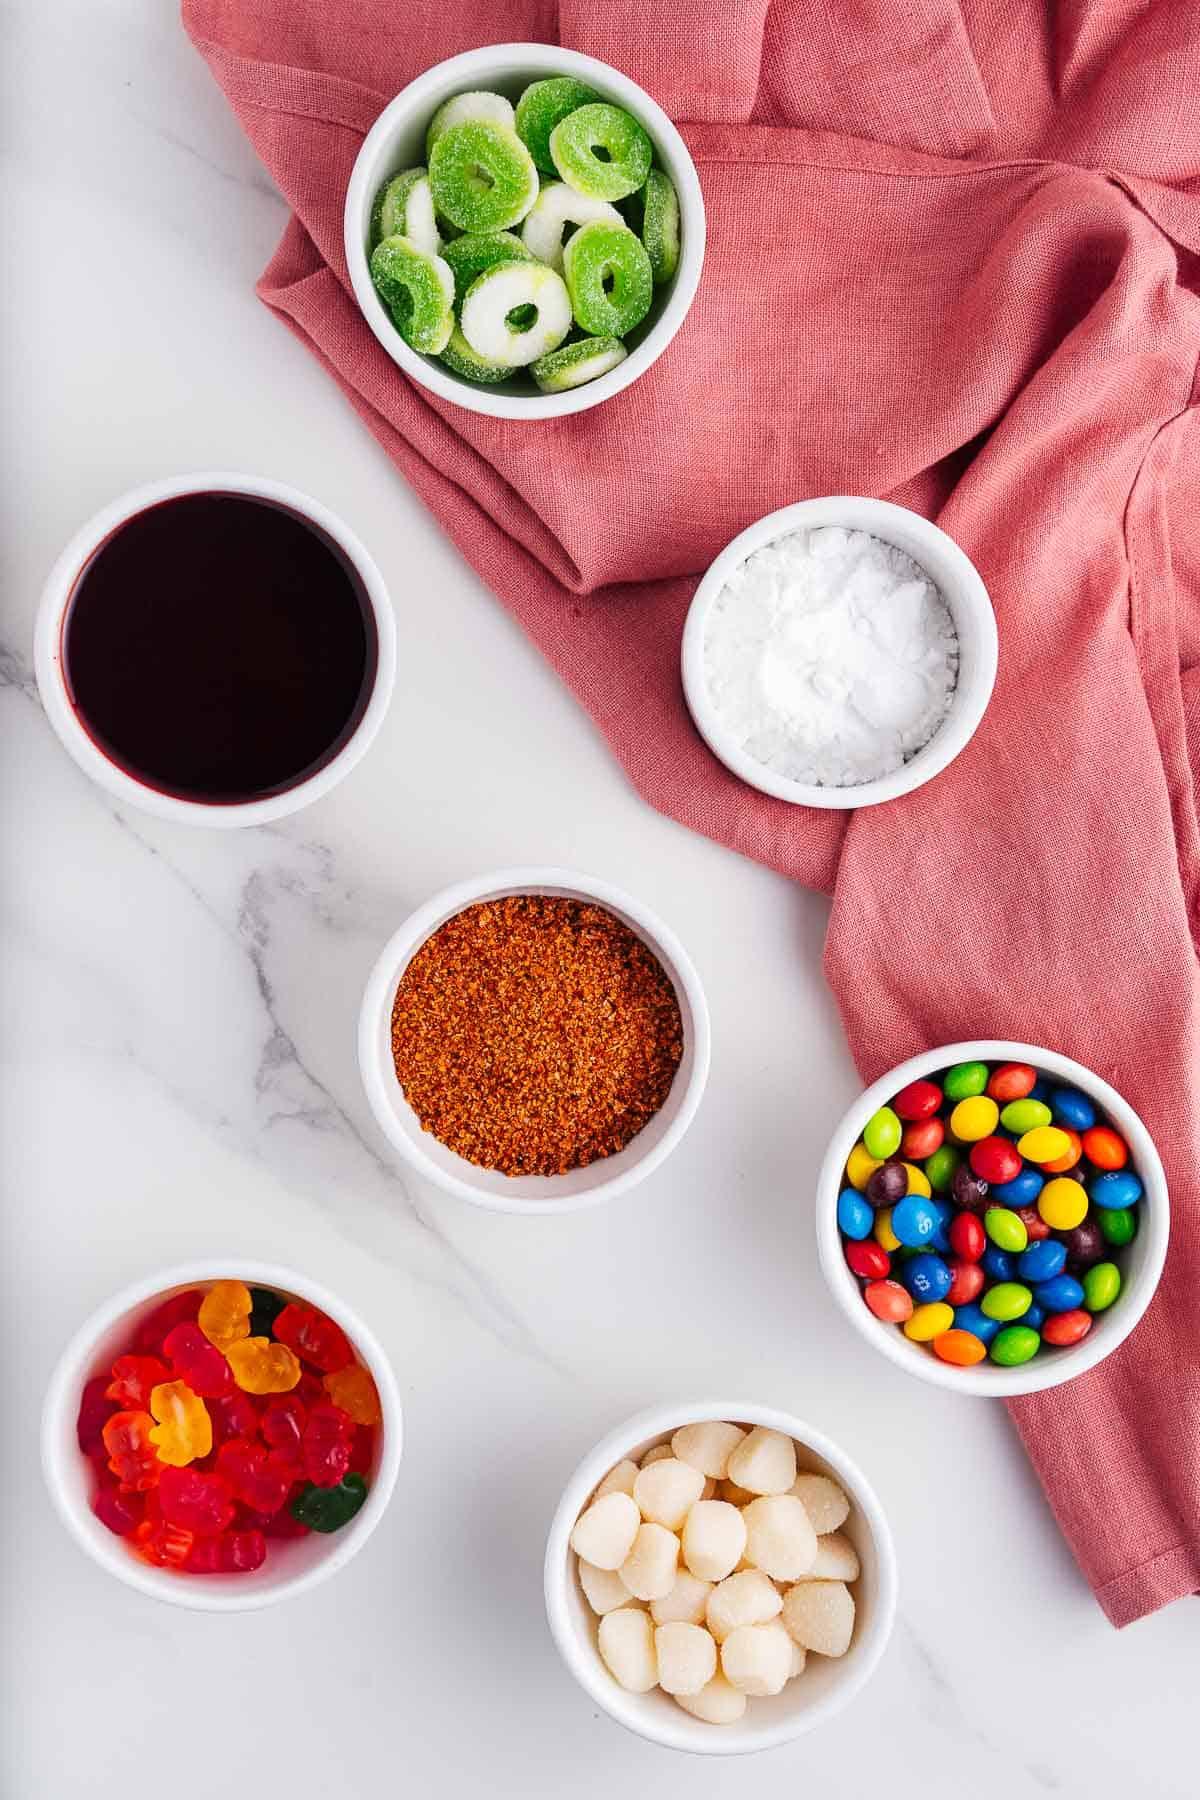 Candy, Tajin, Powdered Sugar, and Chamoy in Bowls